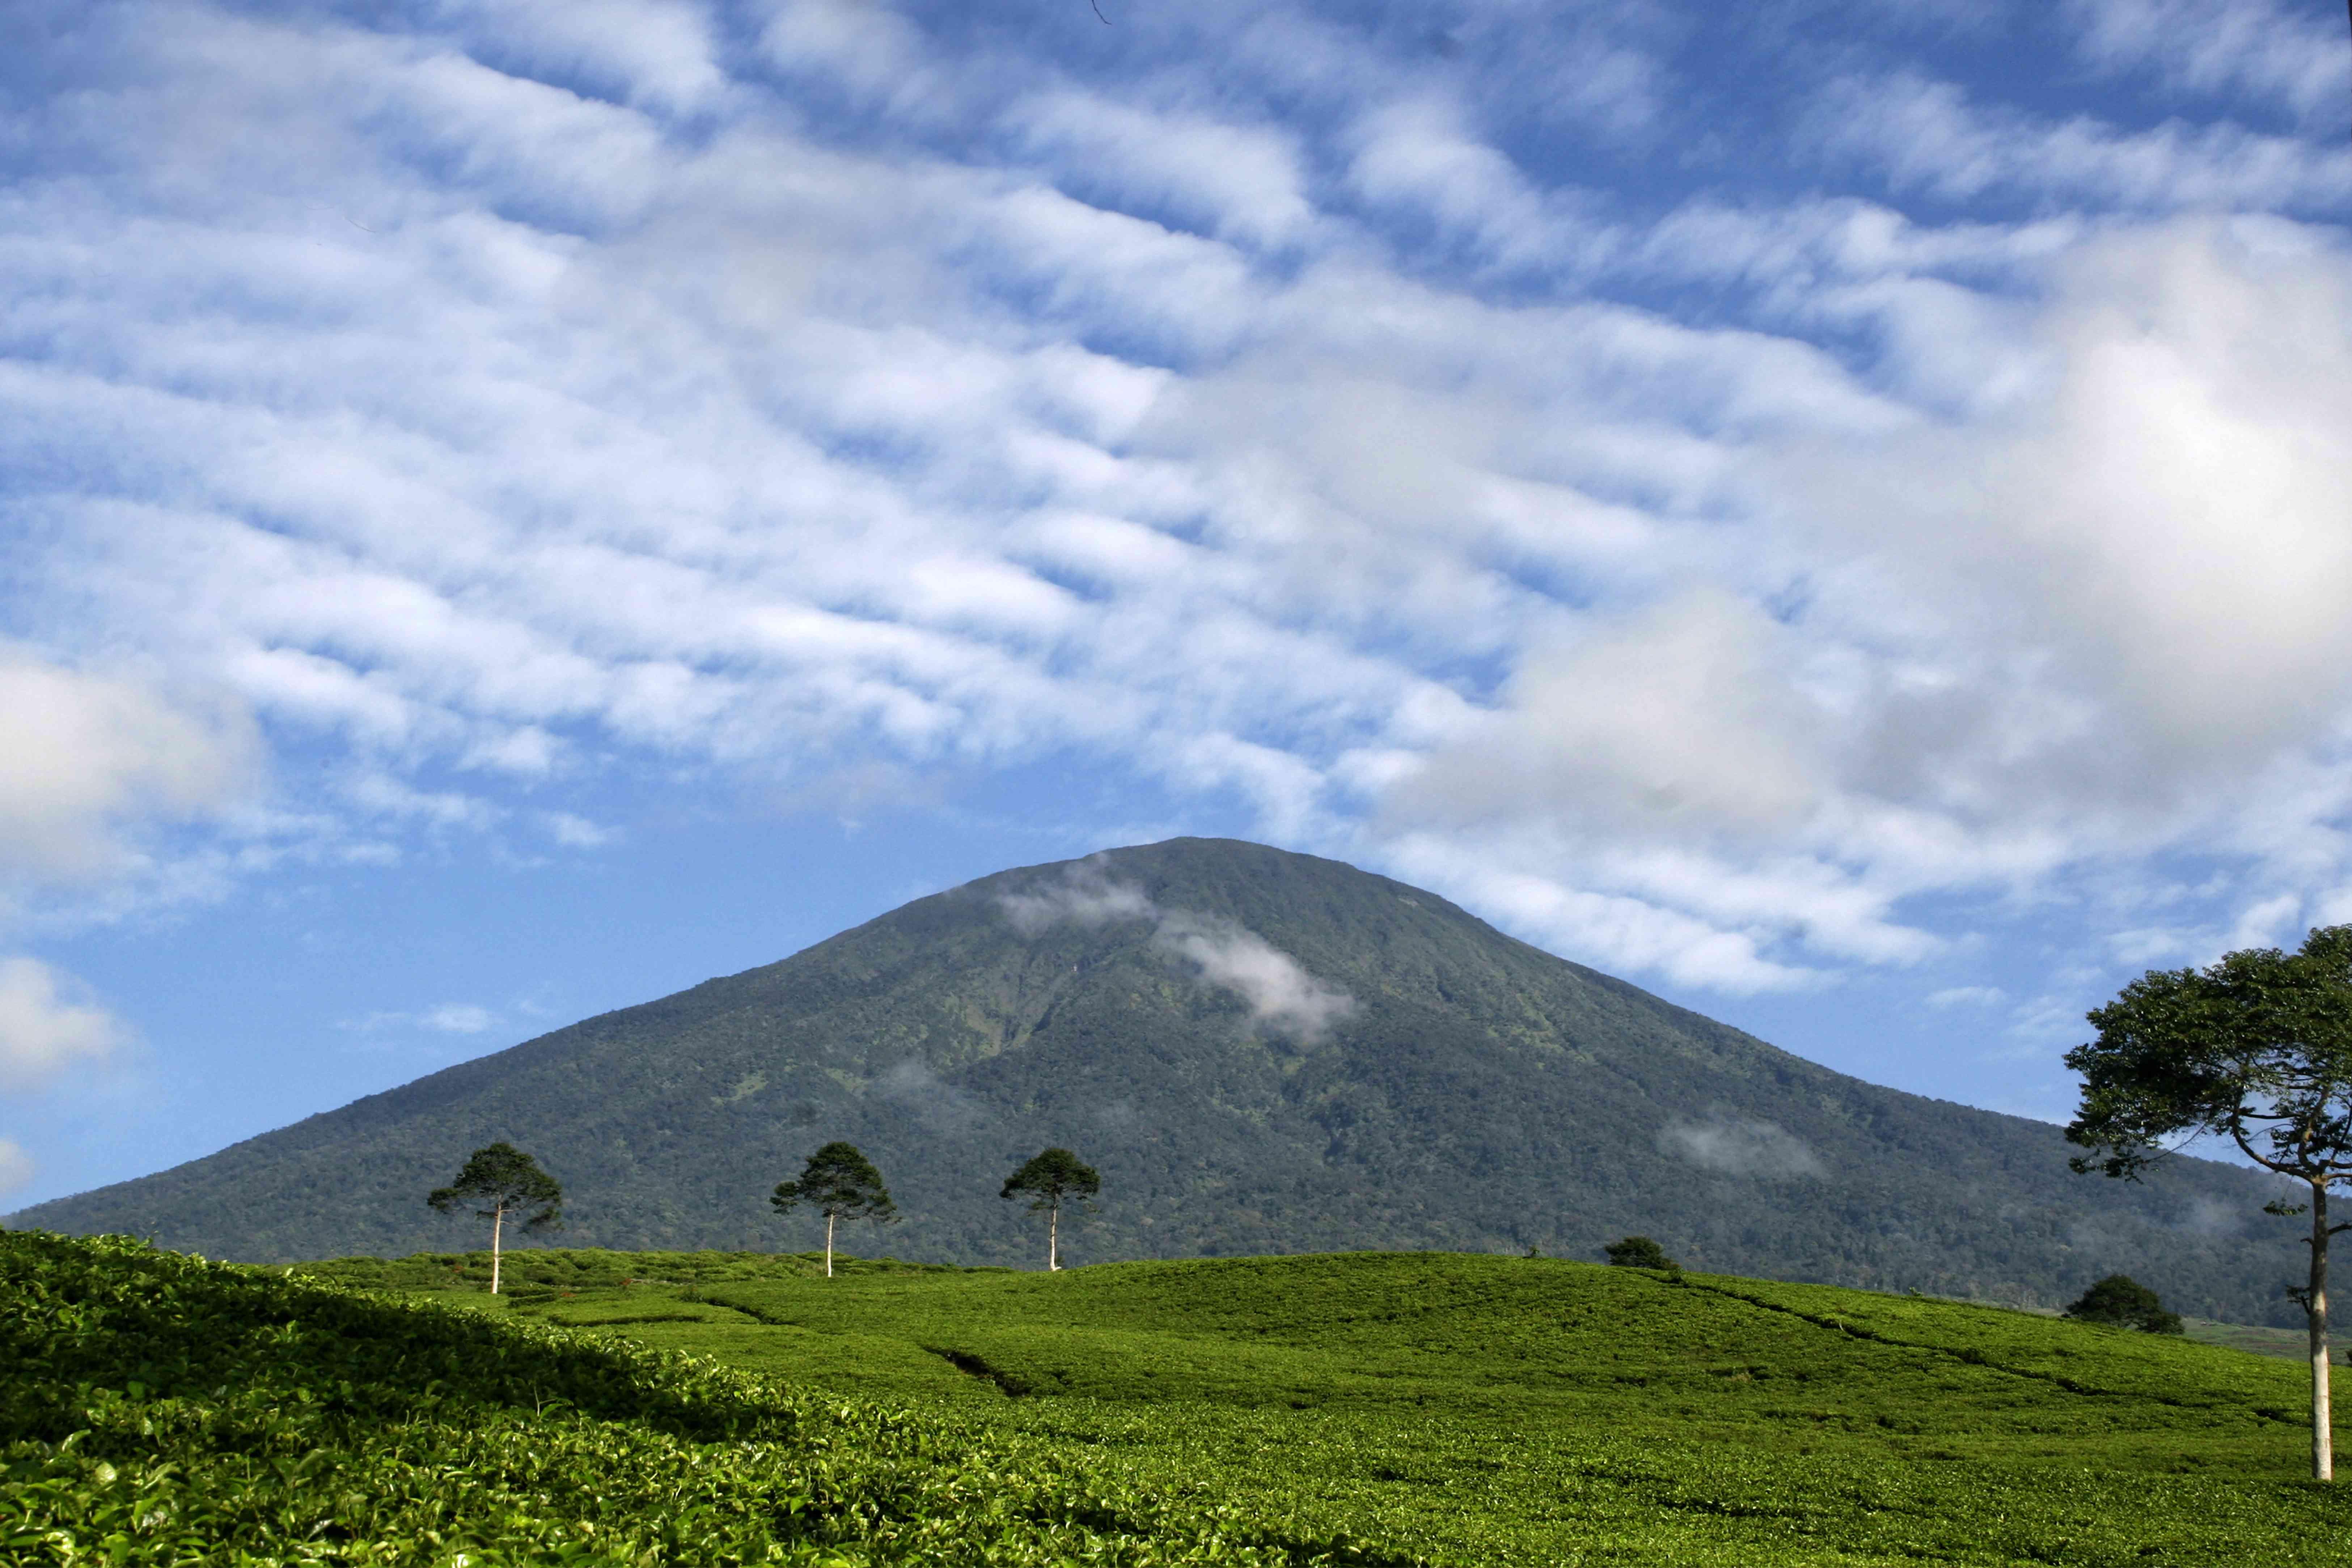 Mount Dempo and tea plantation, Pagar Alam, South Sumatra, Indonesia